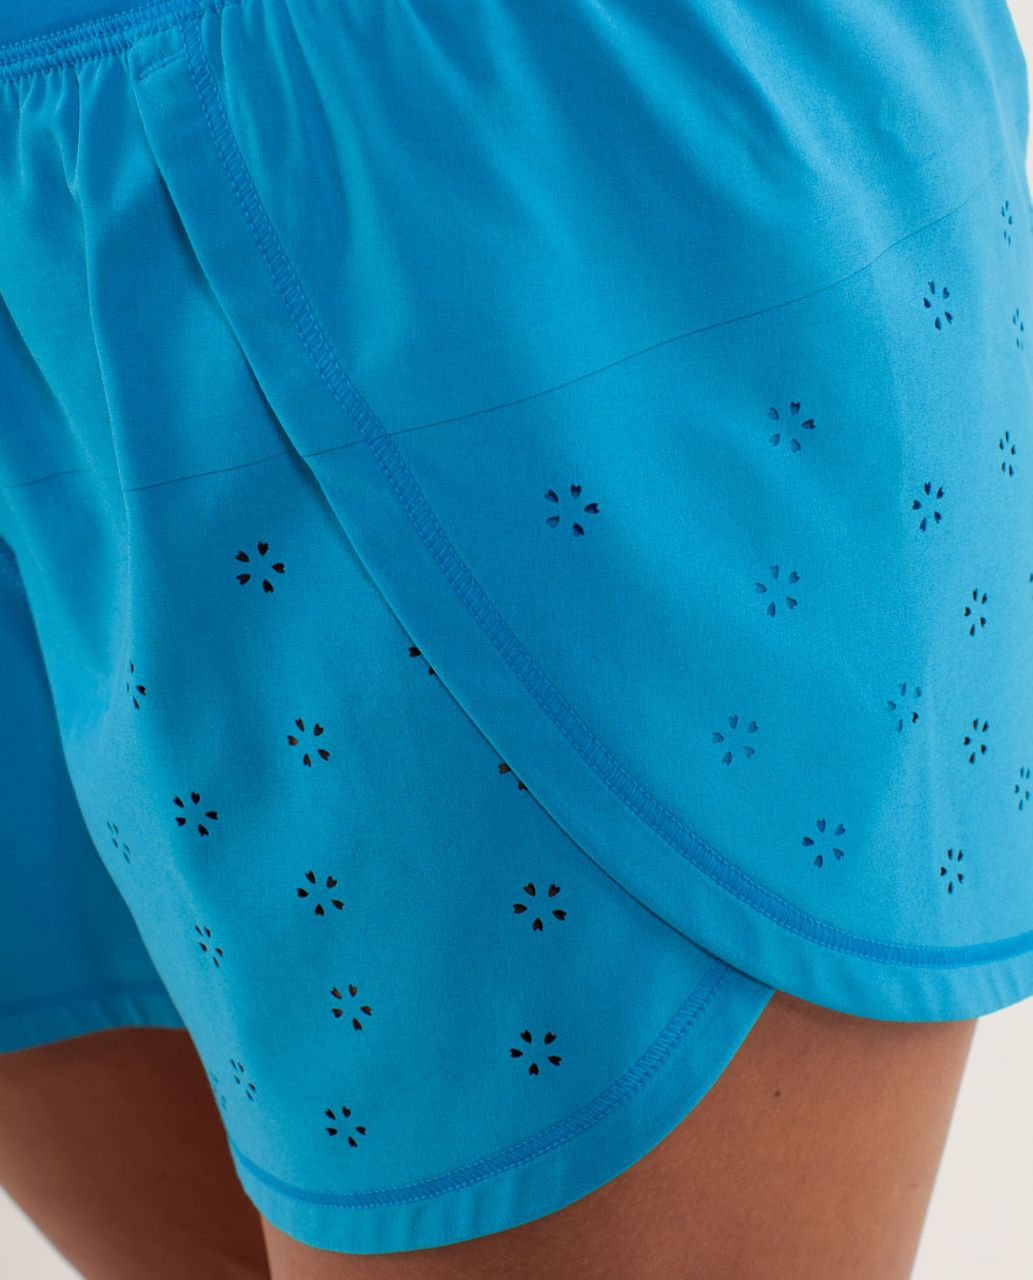 Lululemon Run:  Breeze By Short *Laser Cut - Beach Blanket Blue